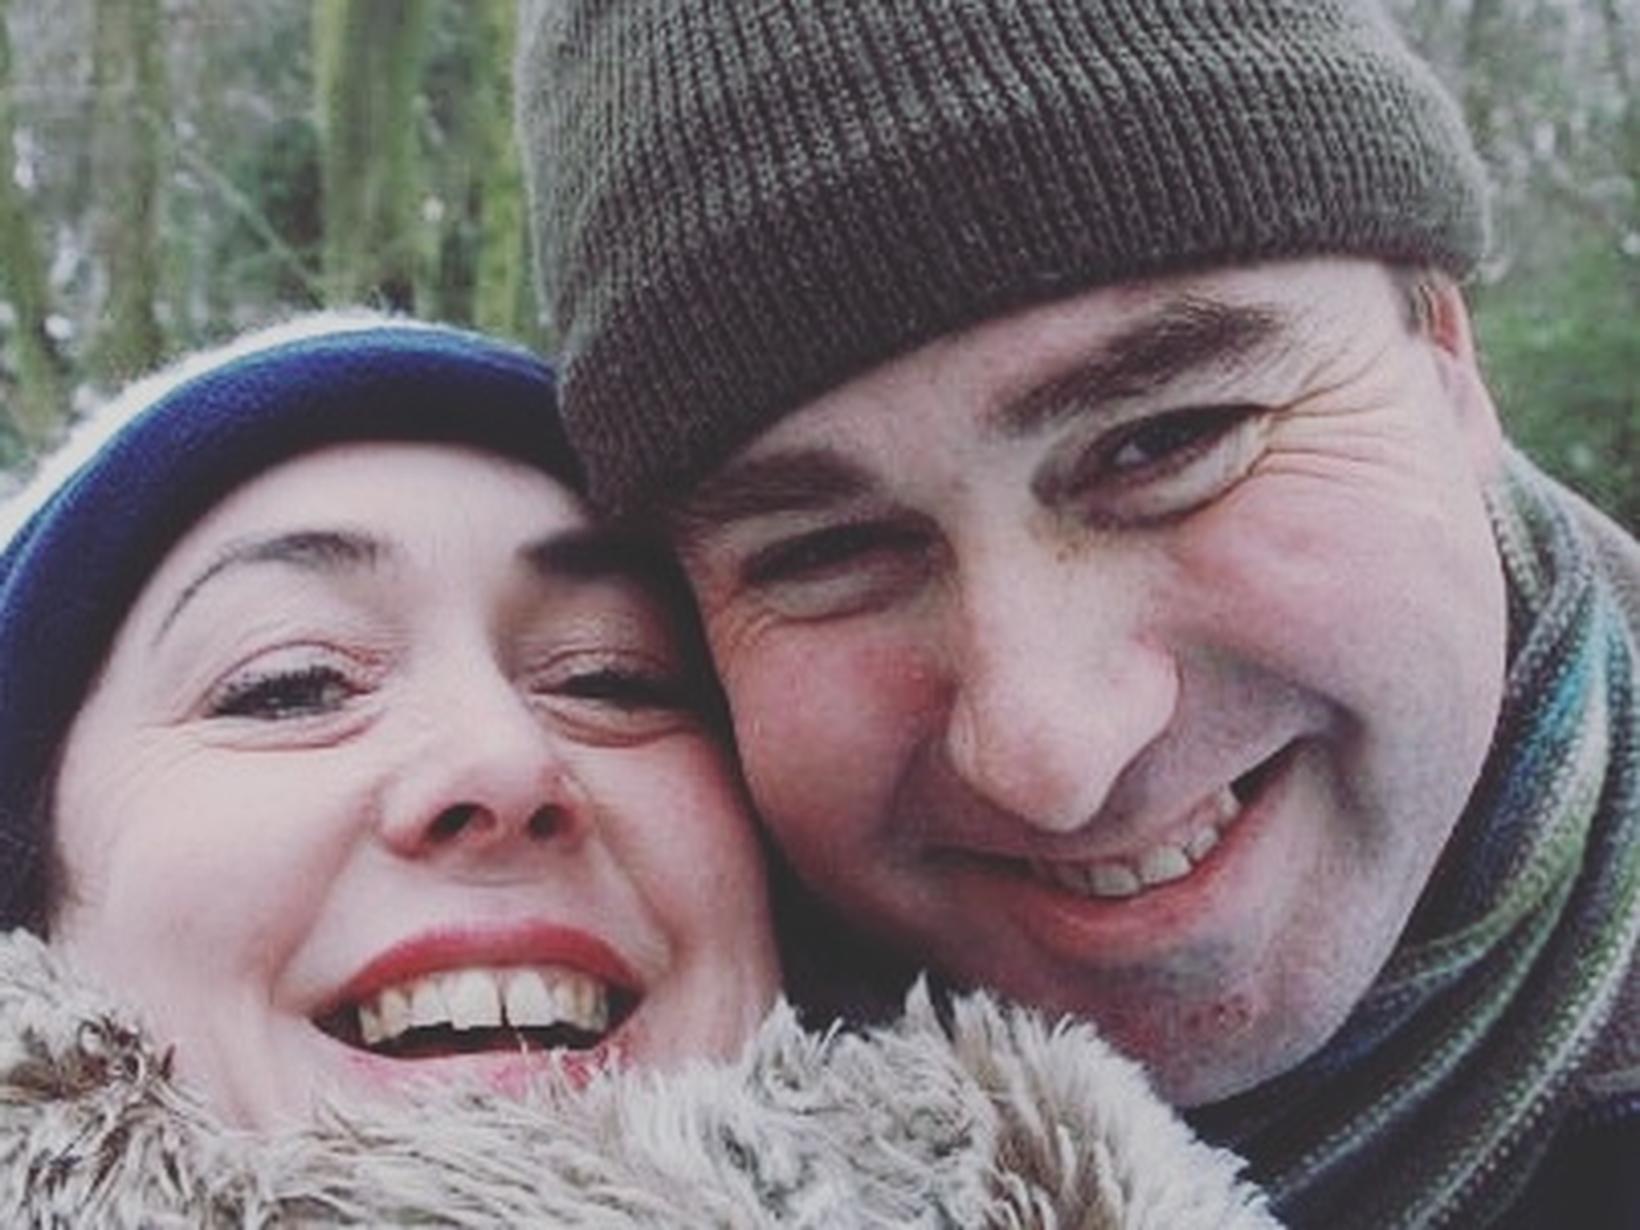 Faye & David from Newcastle, New South Wales, Australia